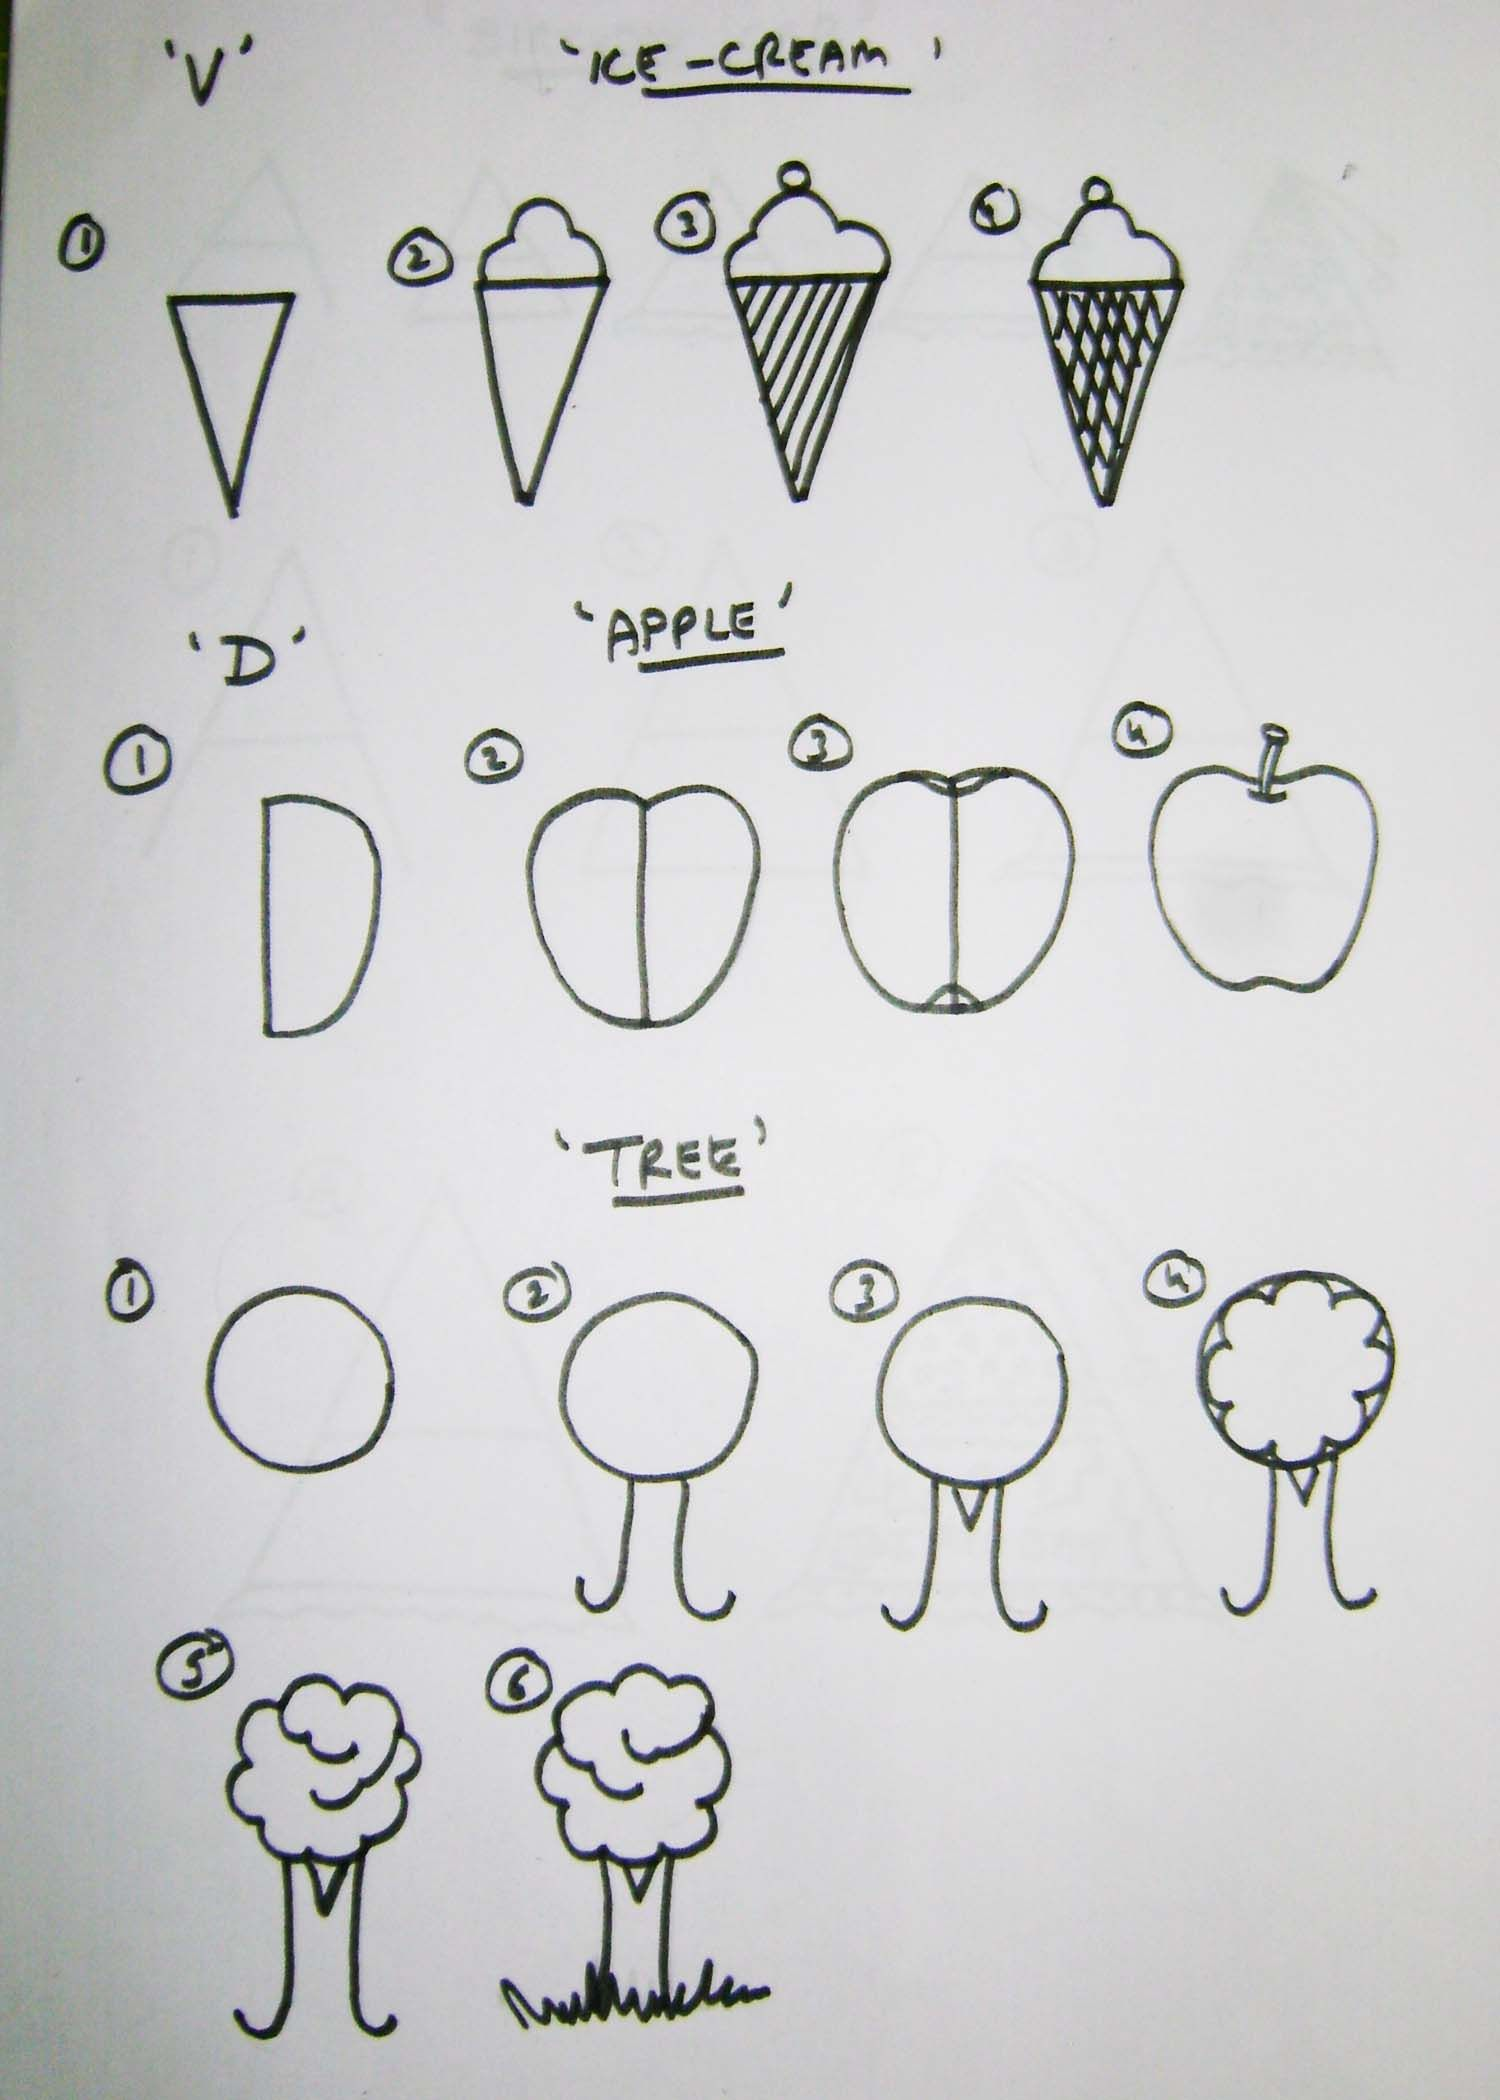 How to start teaching drawing to kids | Teaching drawing, Teach ...